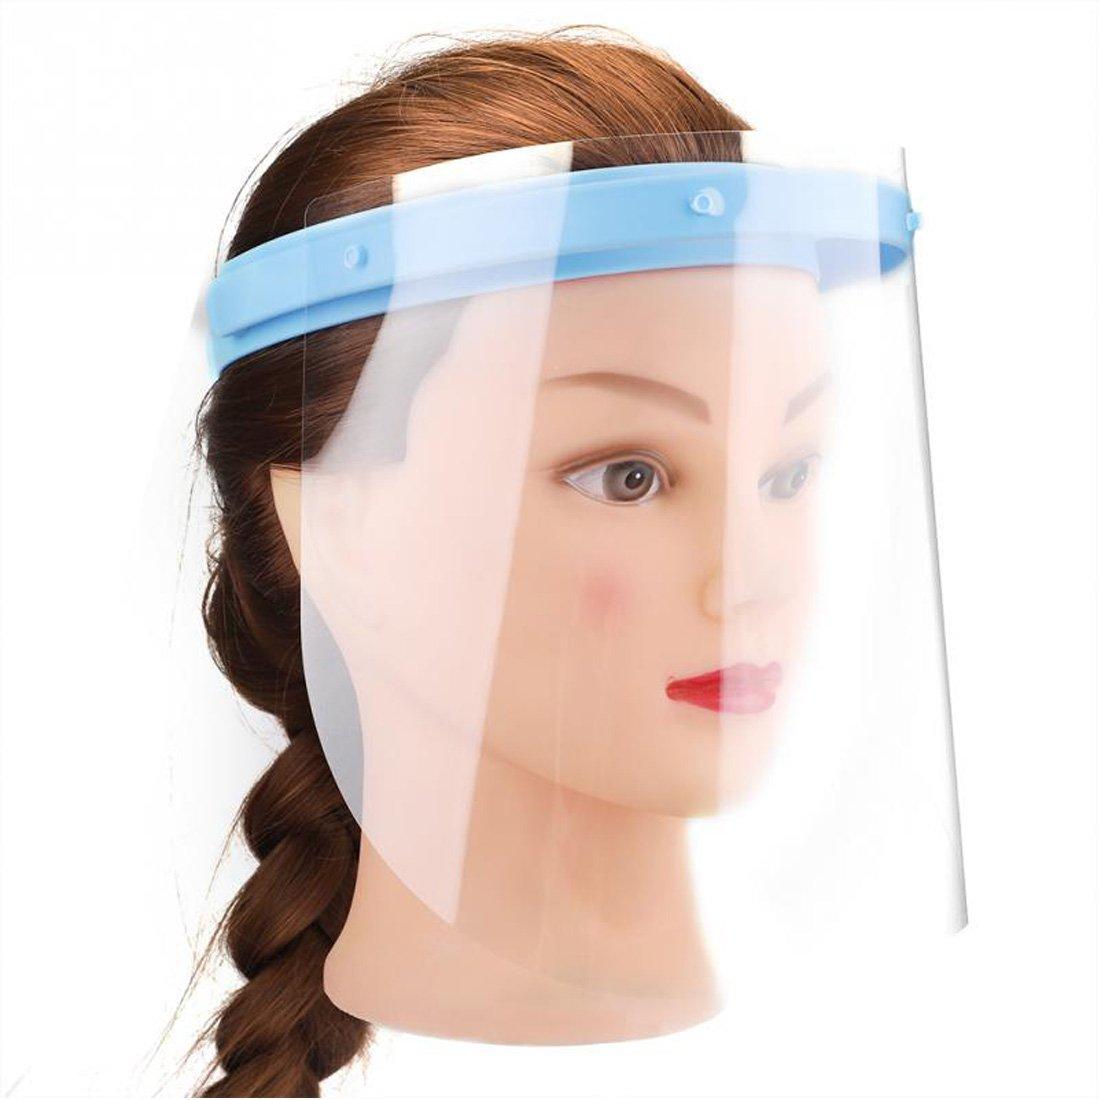 Wecando Anti-fog Adjustable Dental Full Face Shield 10 Plastic Protective Film